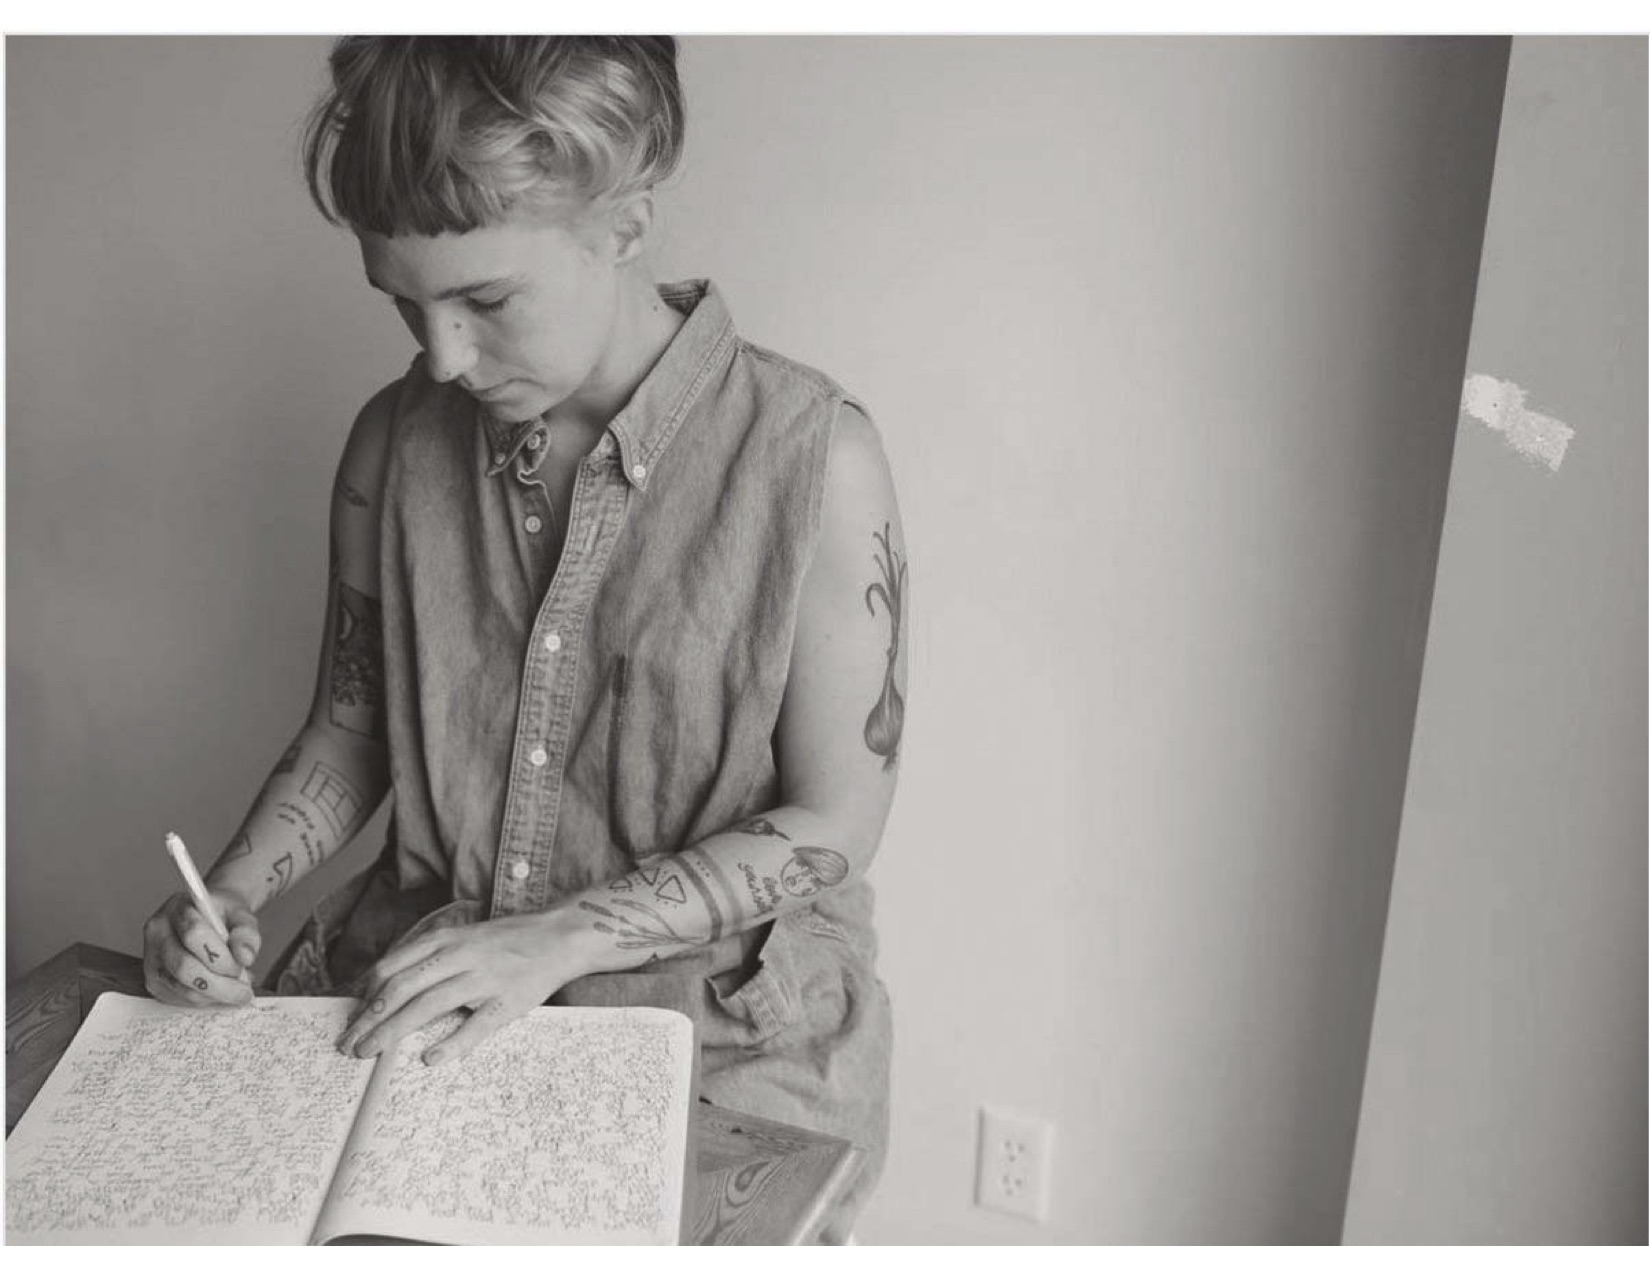 Author photo by  Mae Stier.